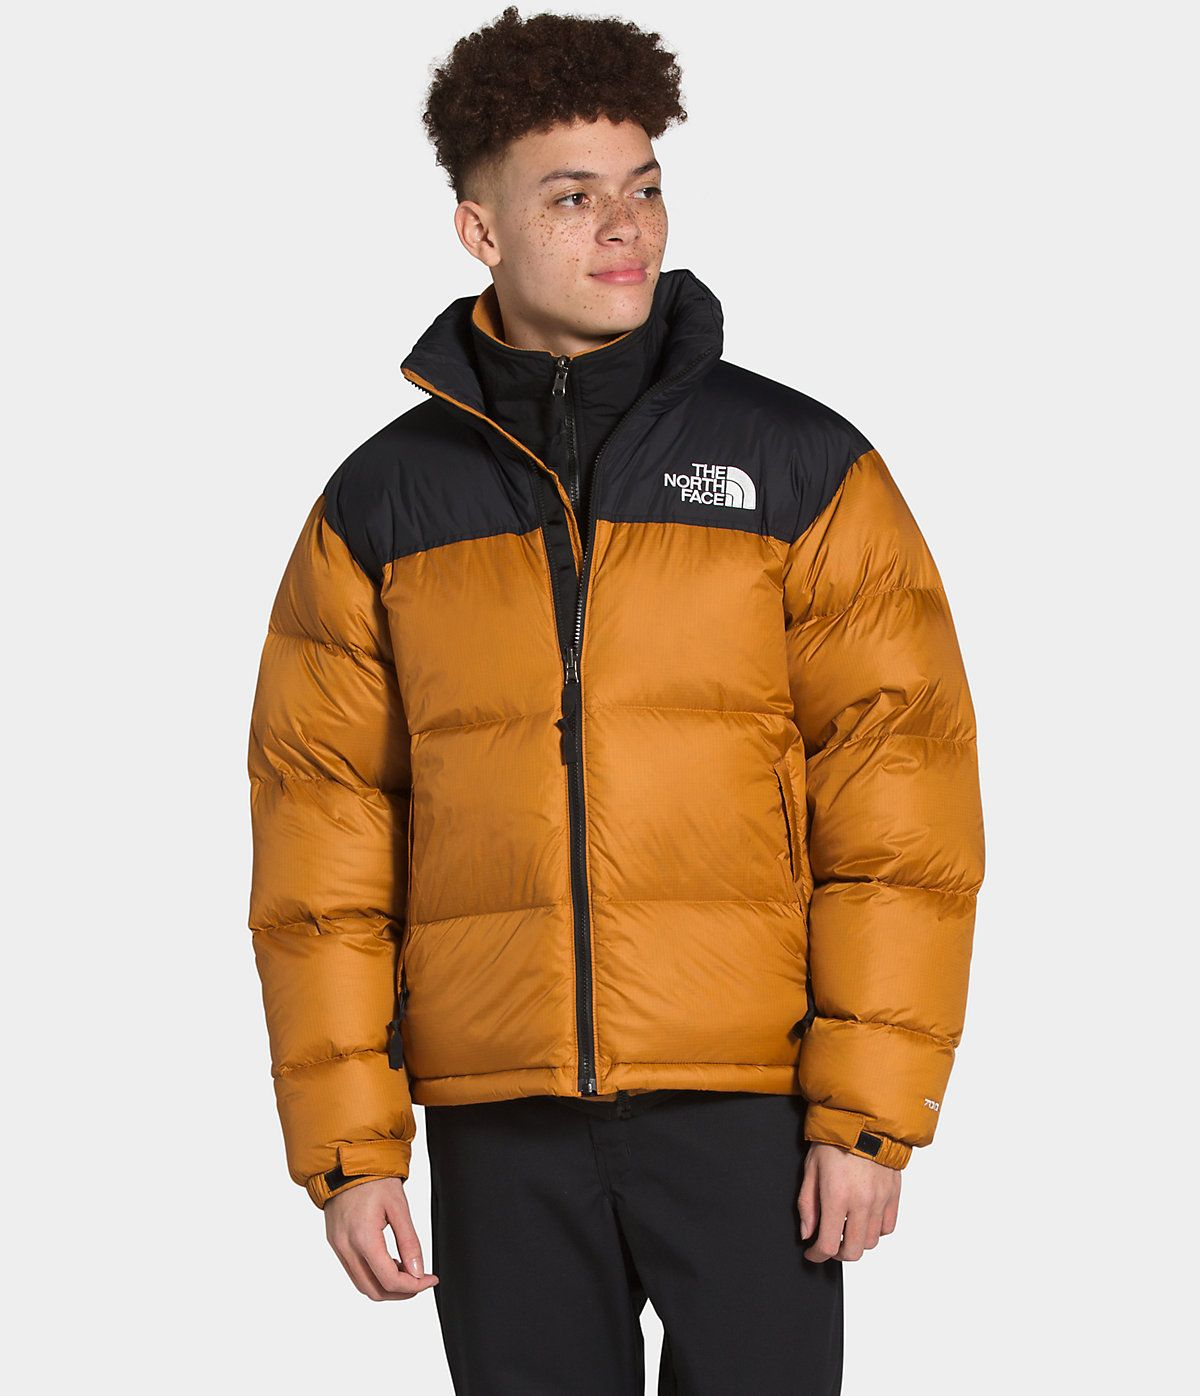 Men S 1996 Retro Nuptse Jacket The North Face Nuptse Jacket 1996 Retro Nuptse Jacket Retro Nuptse Jacket [ 1396 x 1200 Pixel ]